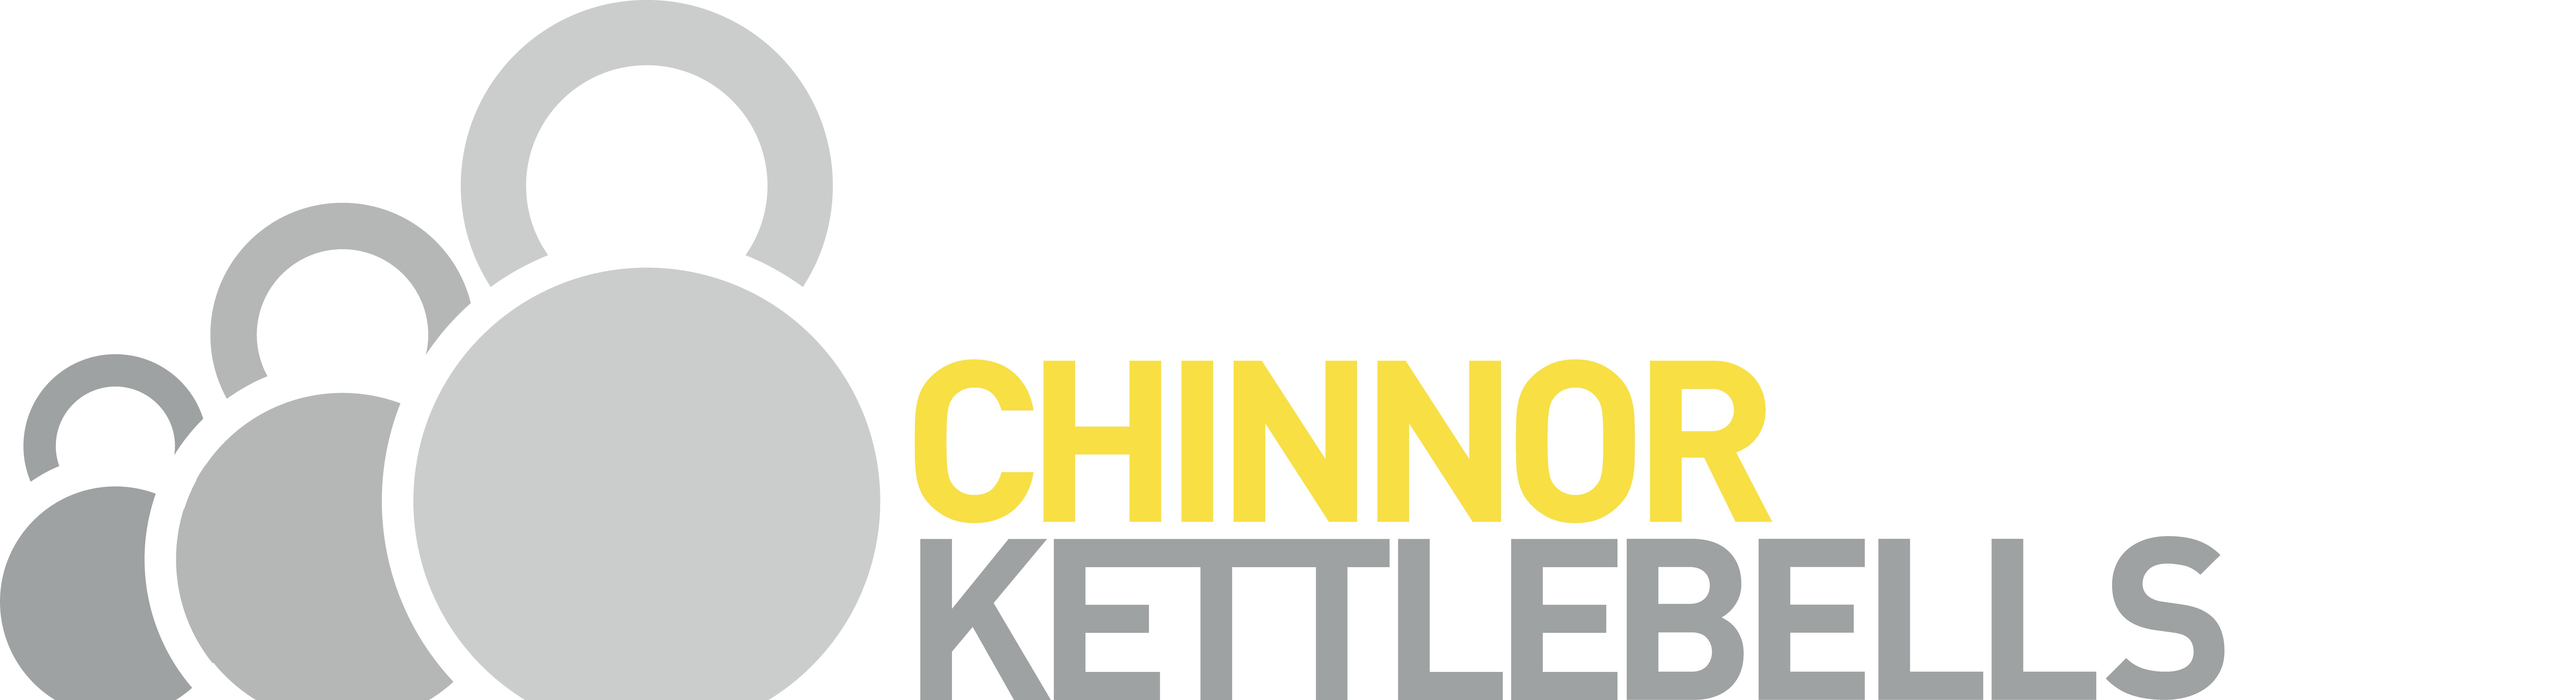 chinnor-kettlebells-logo_high-res